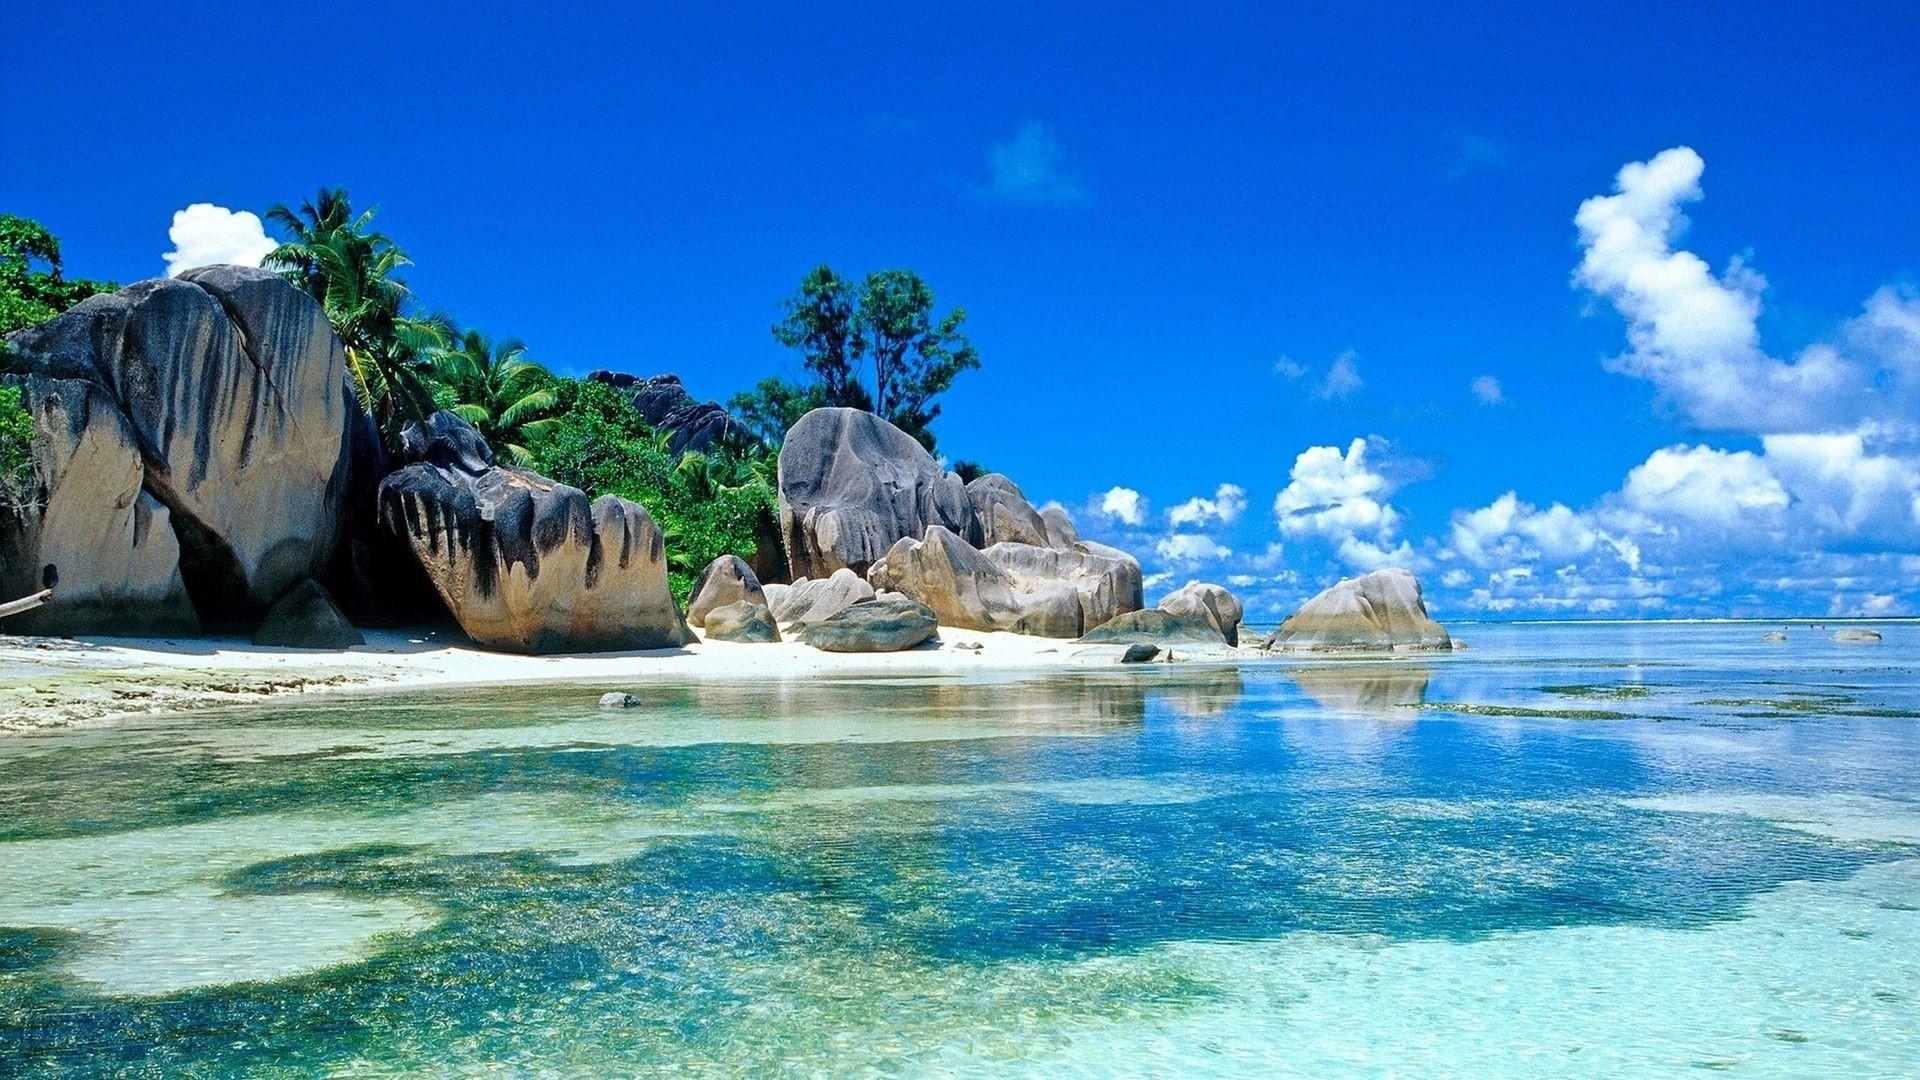 Tropical Beach Landscape Mobile Hd Wallpaper Wallpaper Download High Resolution 4k Wallpaper